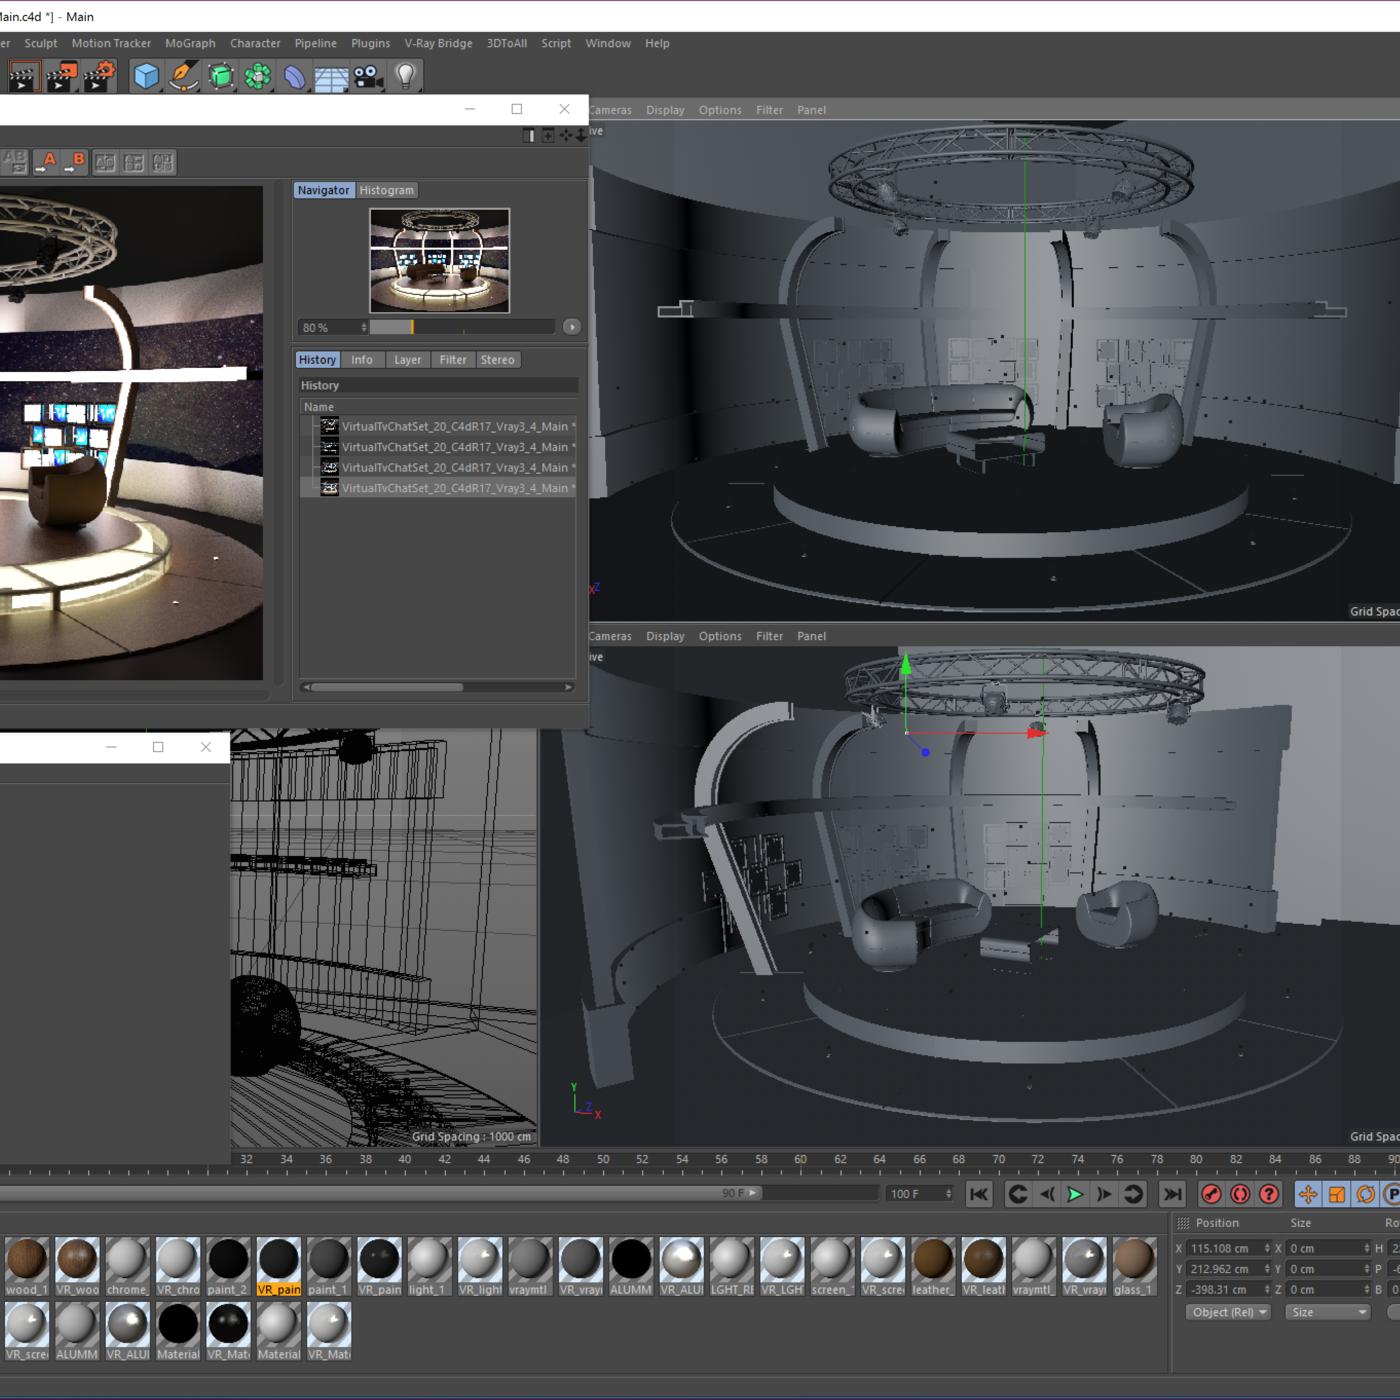 3d Virtual Tv Studio Sets Collection Vol 13 8 Pcs Design Cgtrader